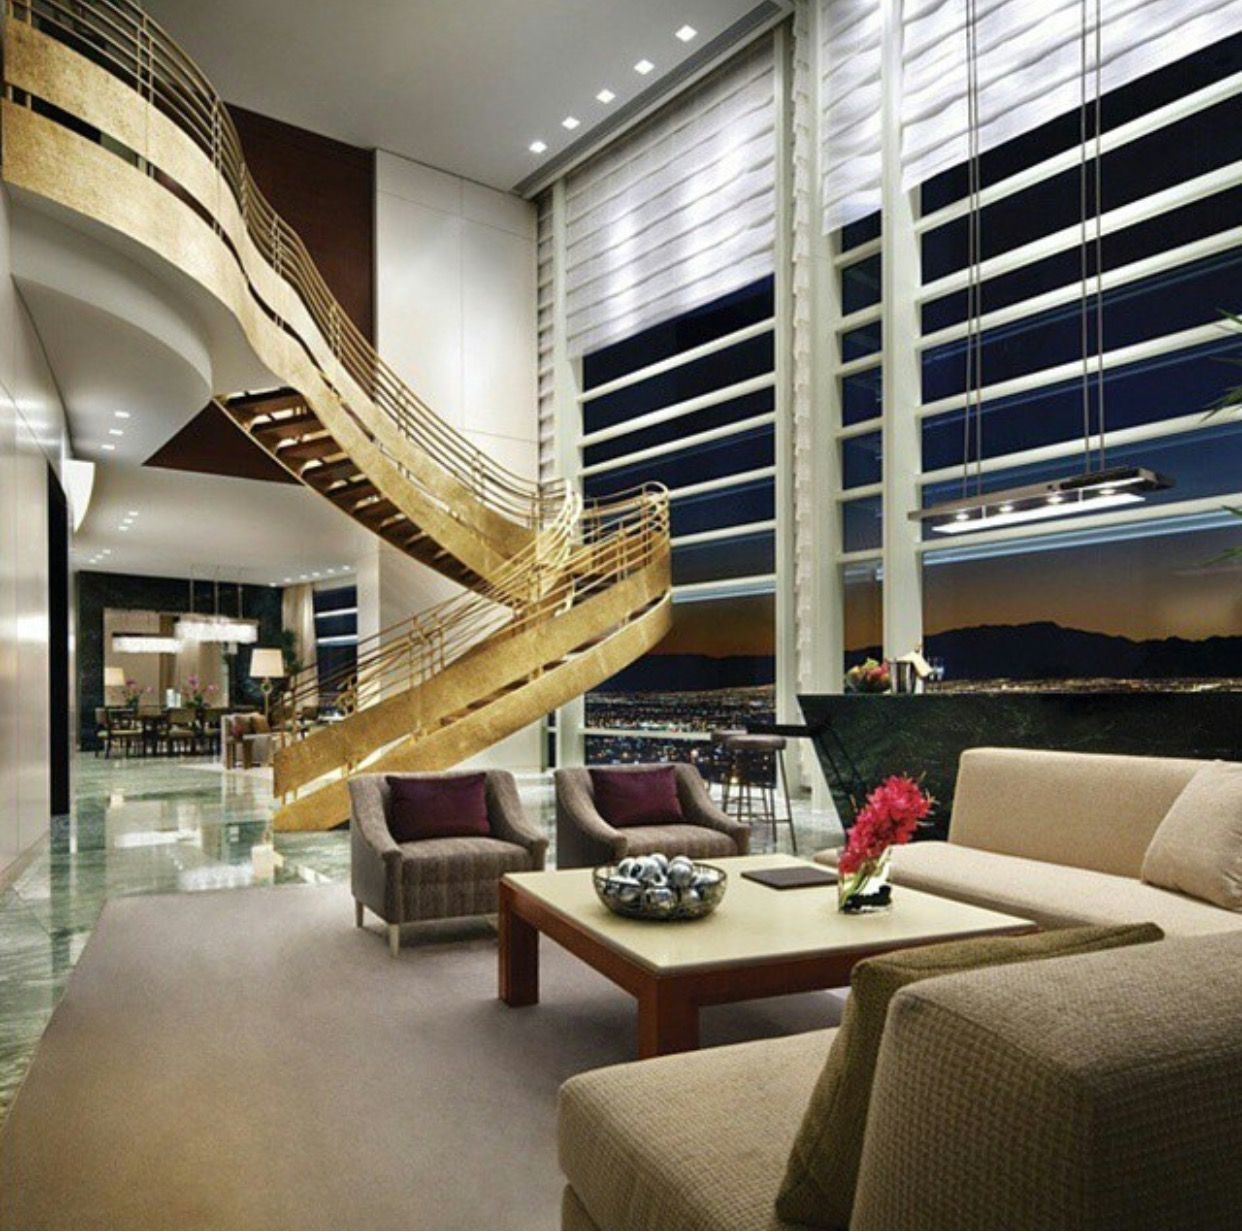 Pin By Melody Eschert On Luxury Living ♛